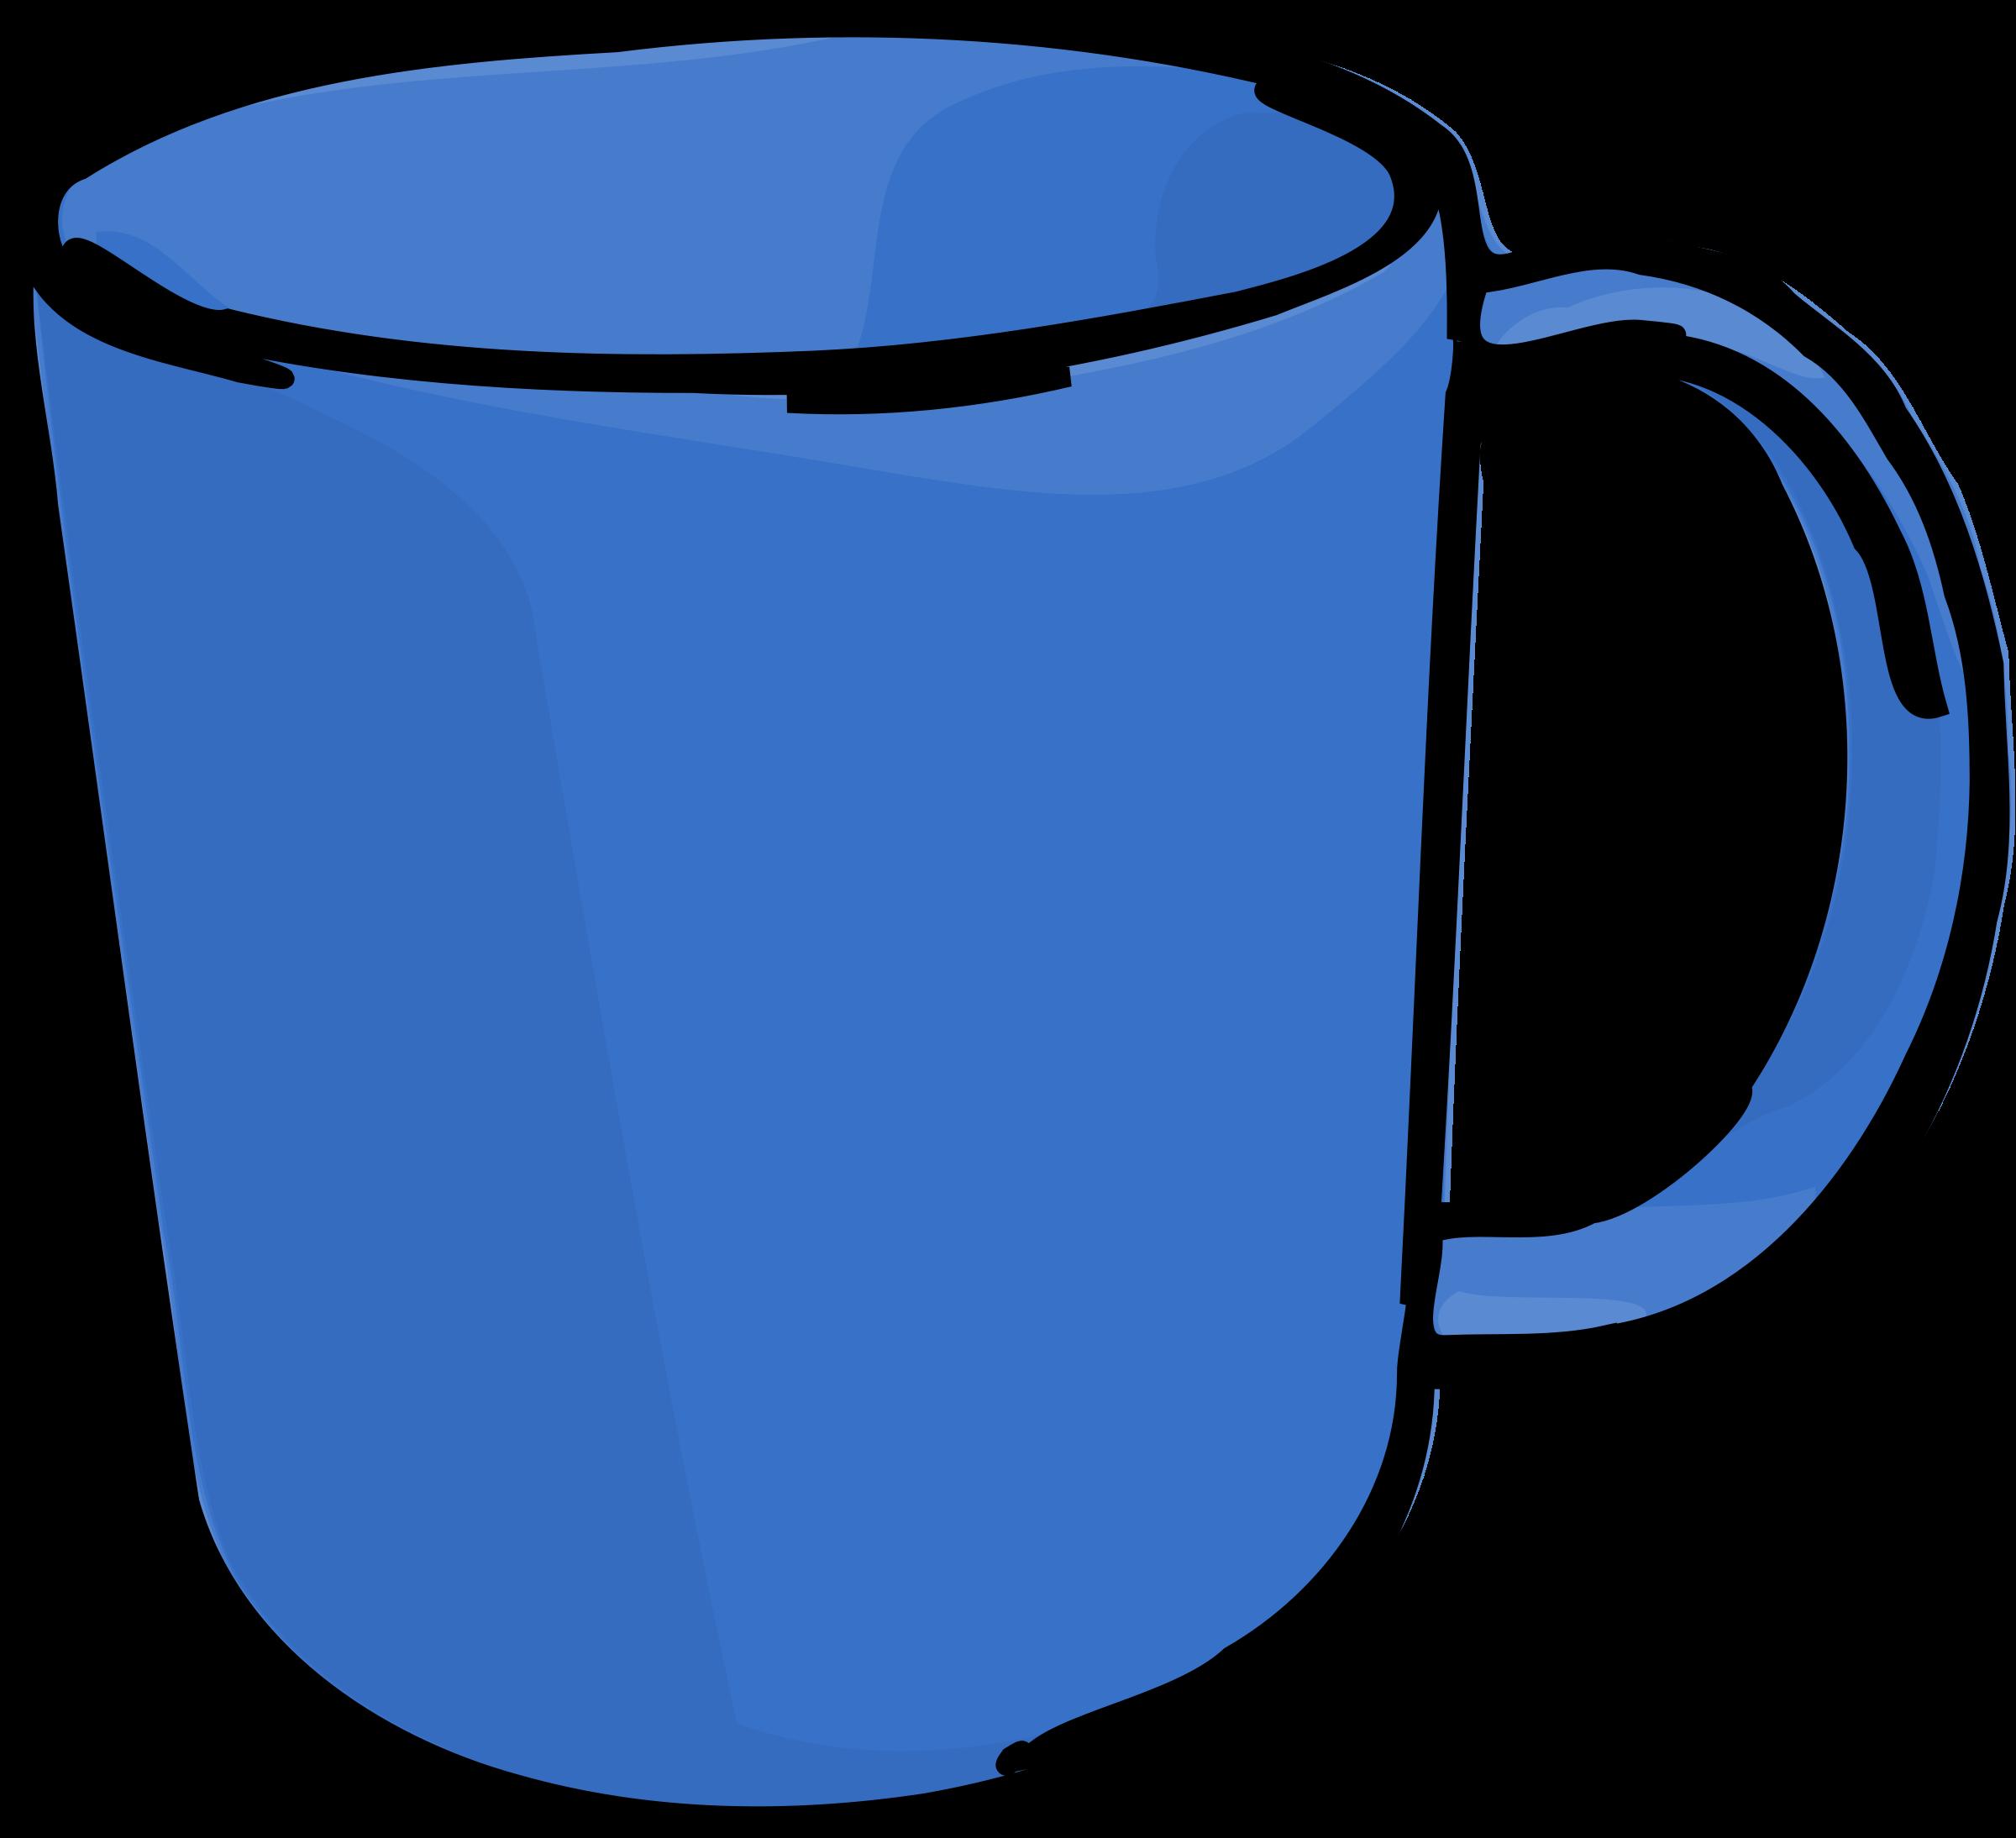 Icons png free and. Mug clipart pink mug